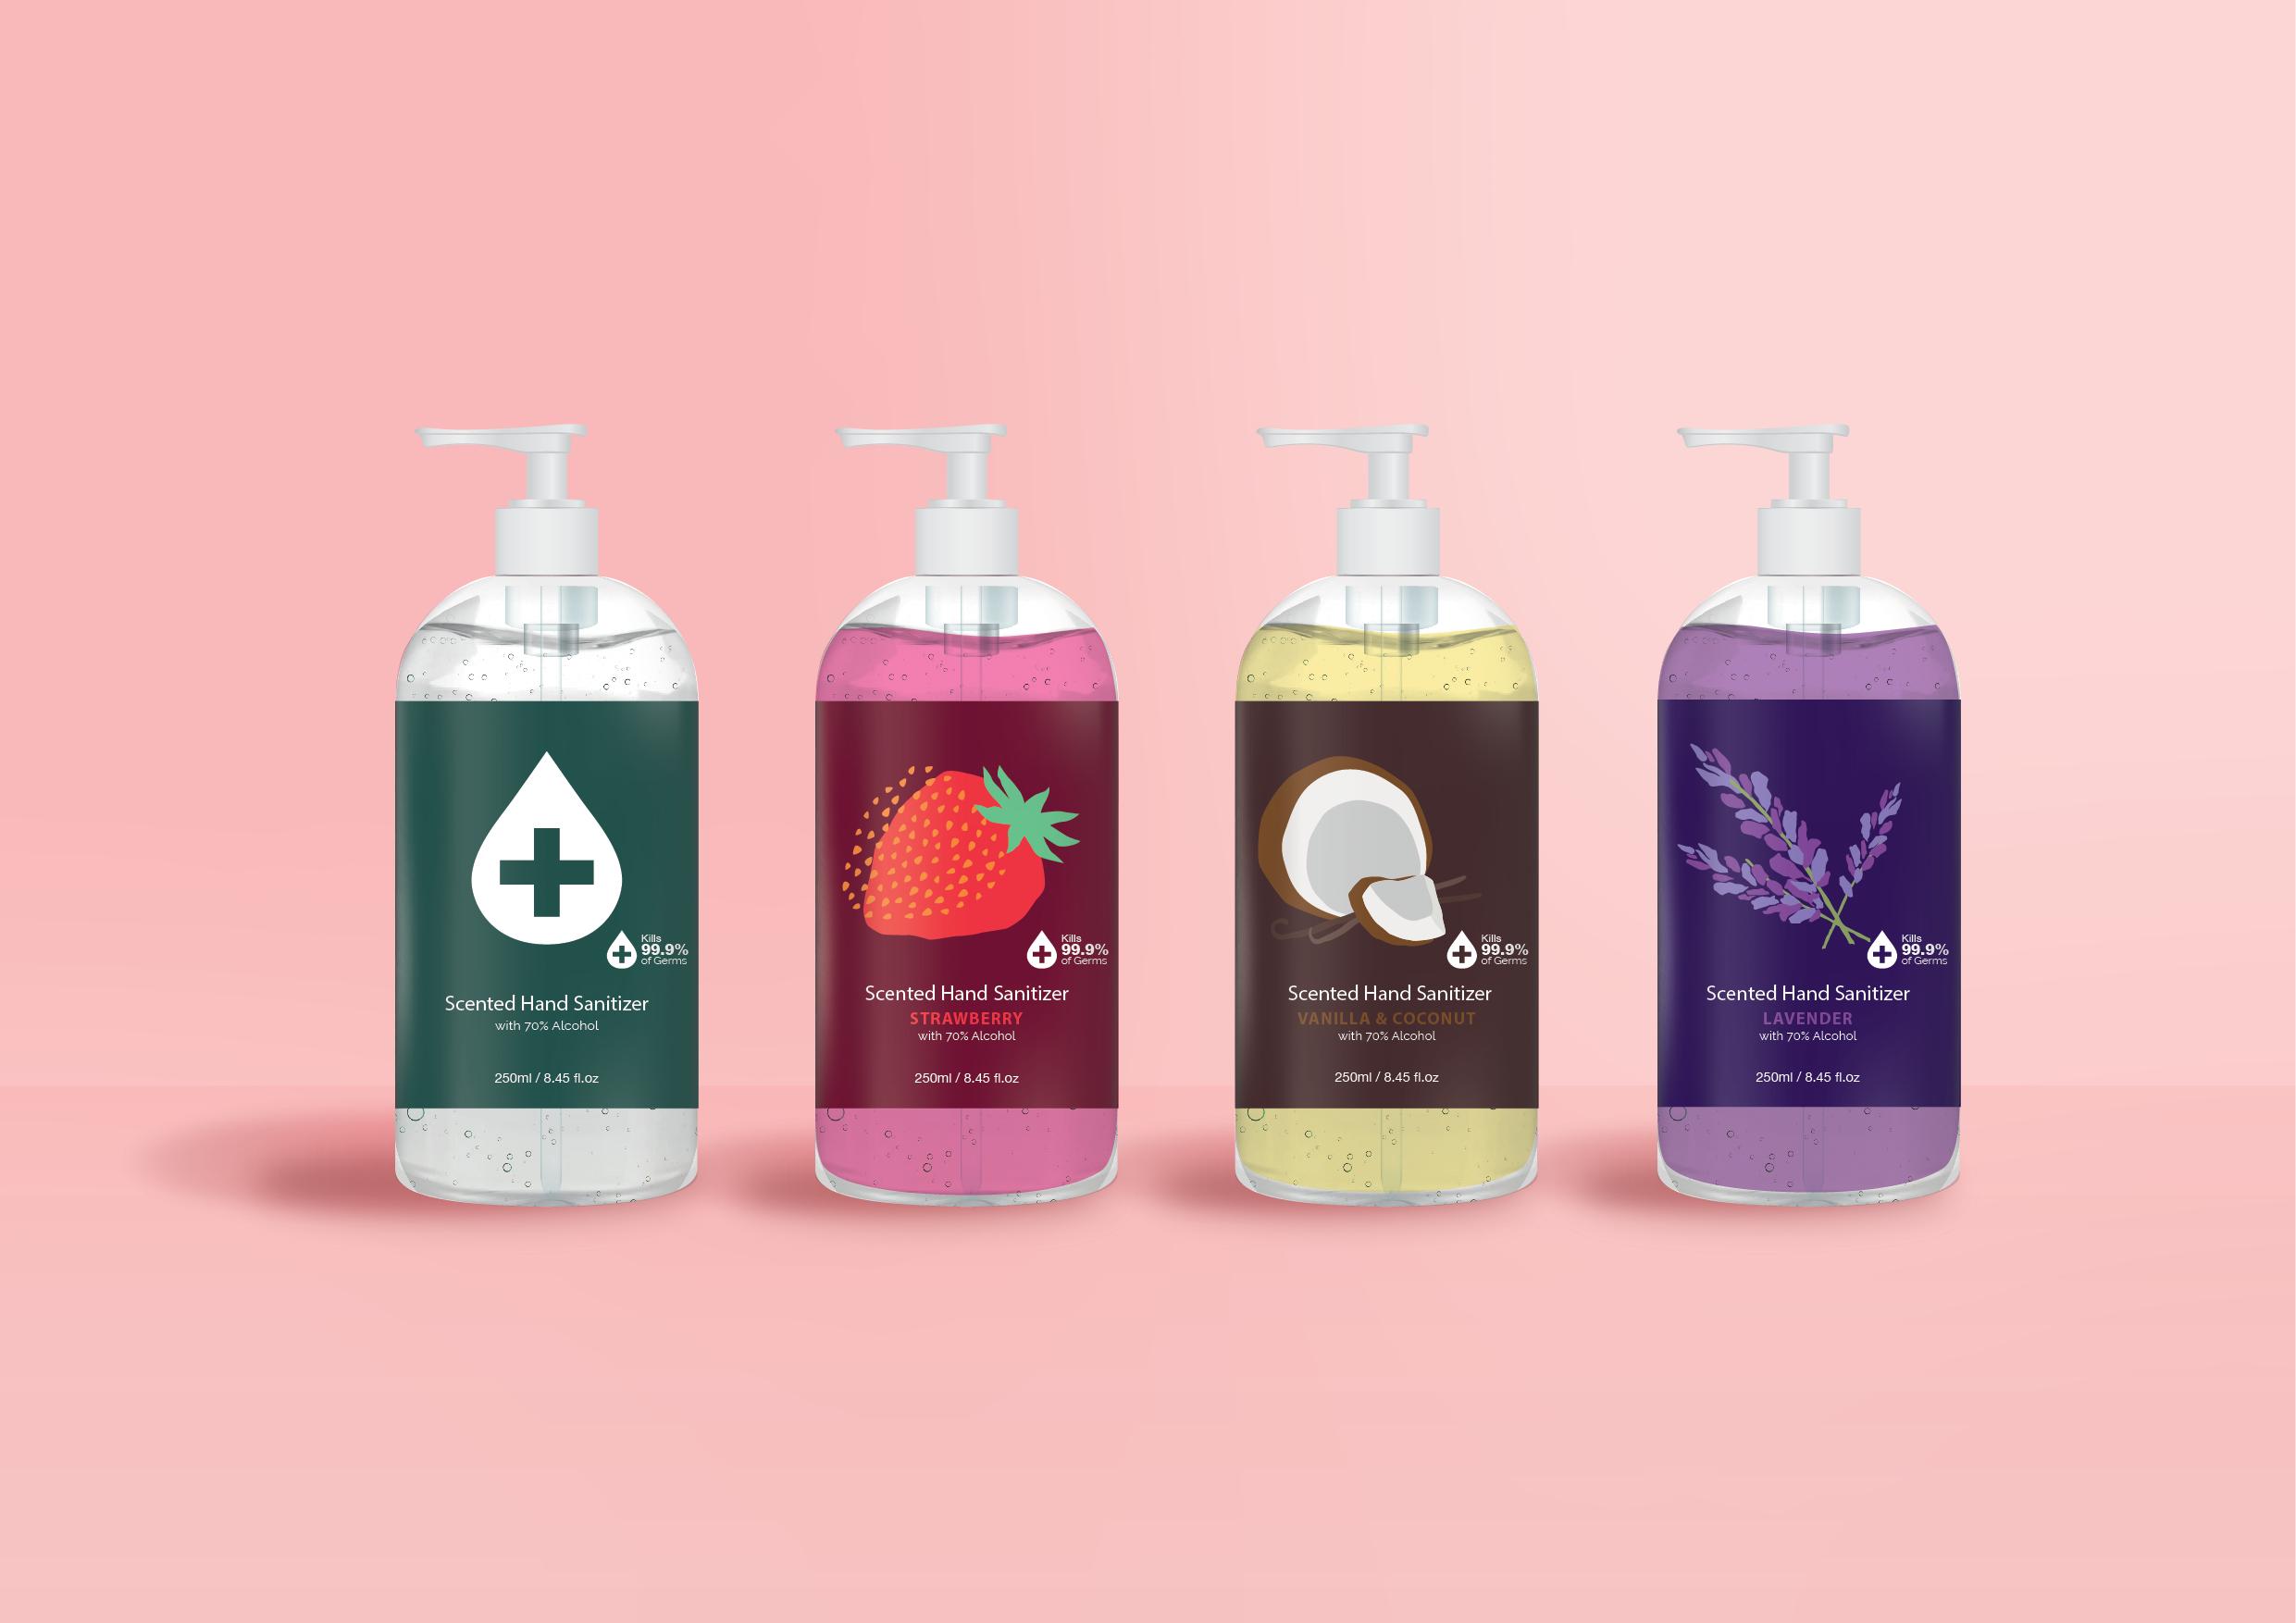 Hand Sanitizer Illustration 002 - OEM ODM Cosmetic Manufacture